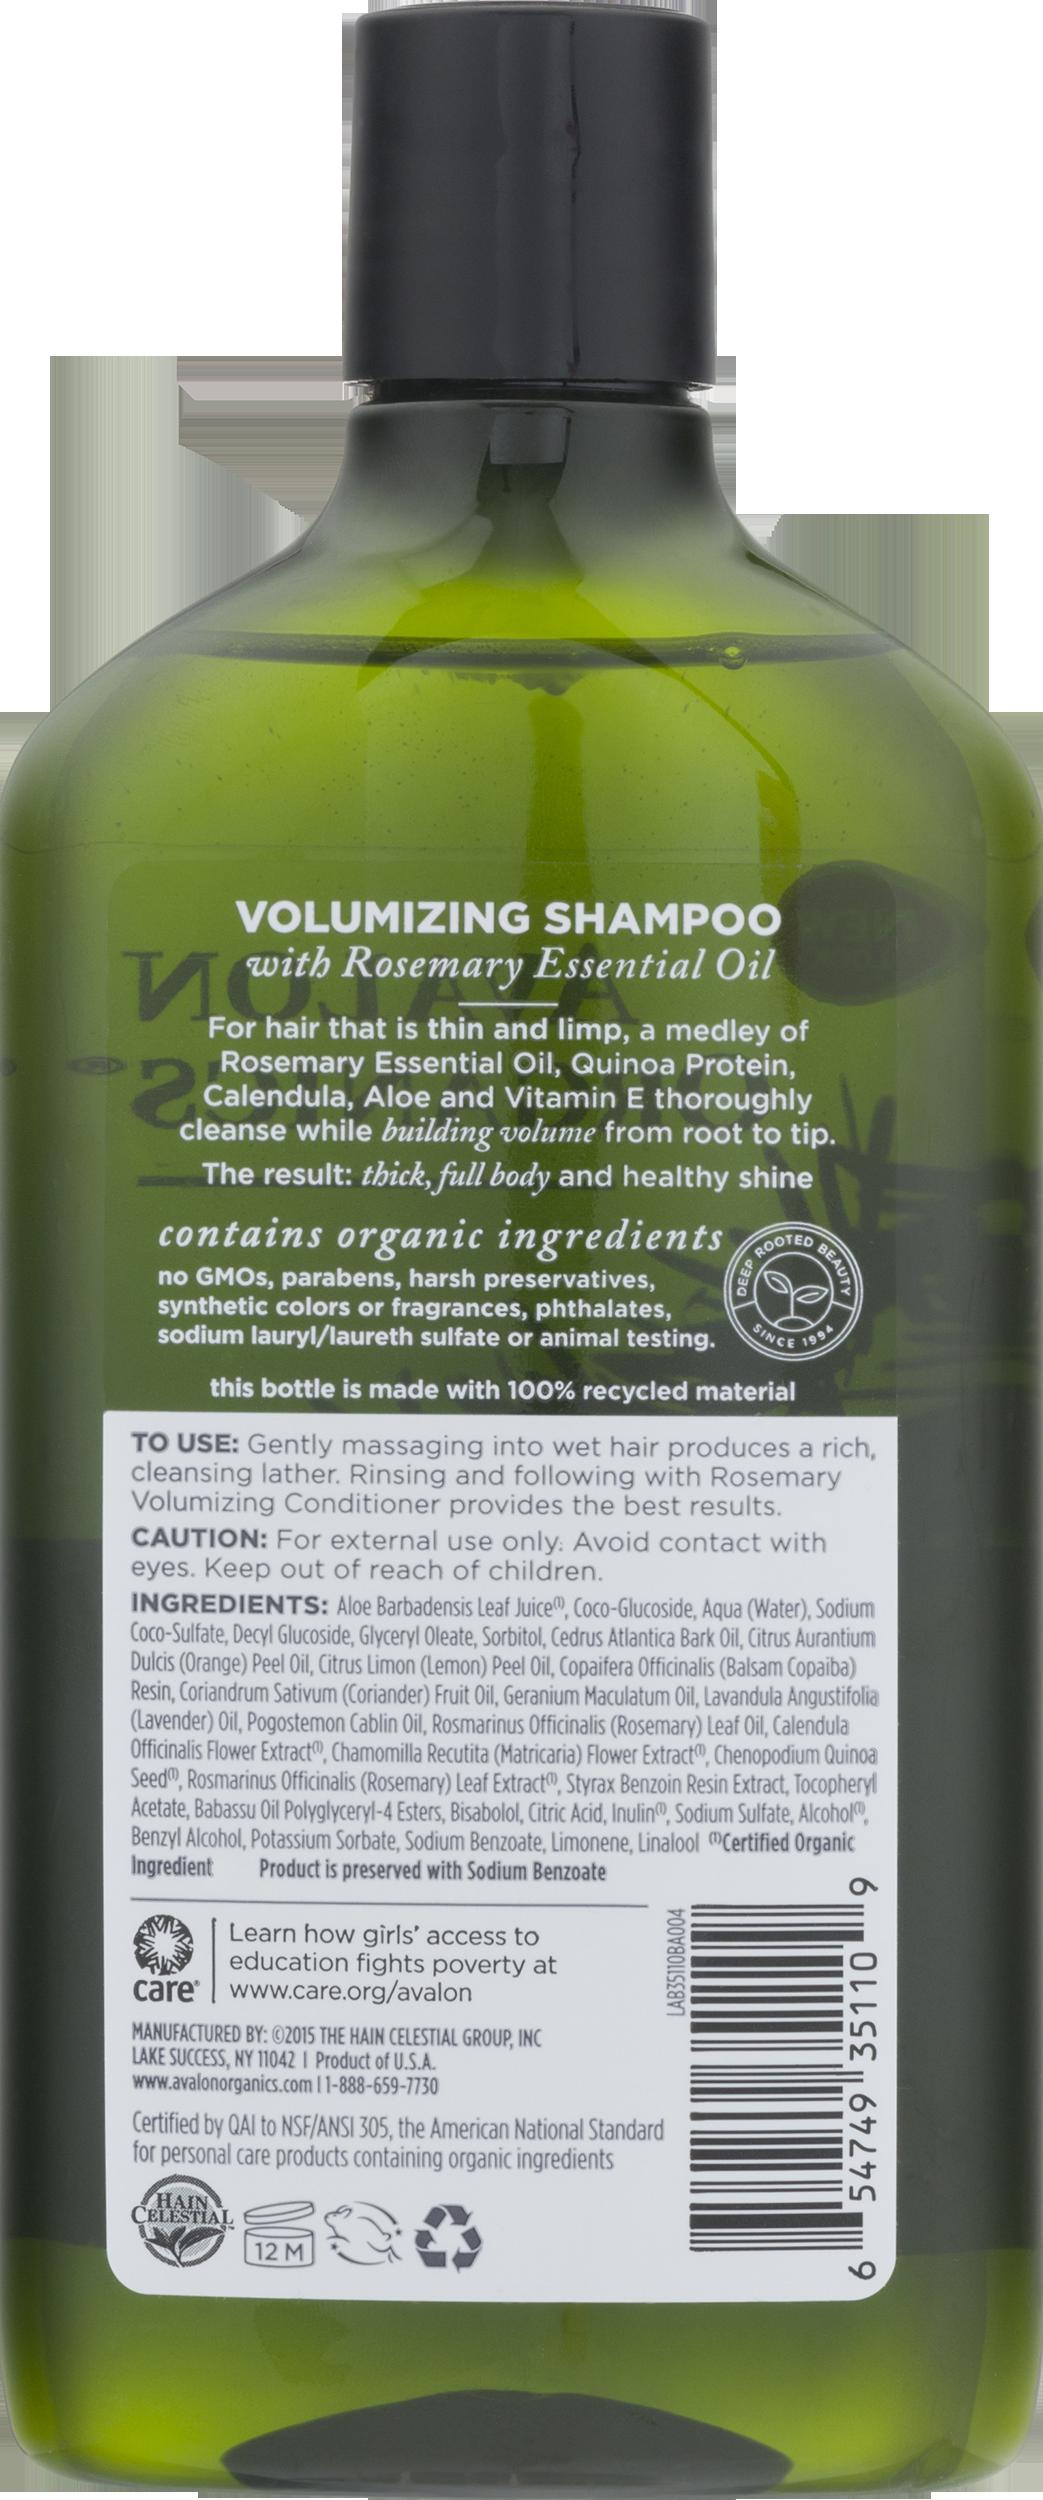 Avalon Organics Volumizing Shampoo Rosemary 11 Oz Walmart